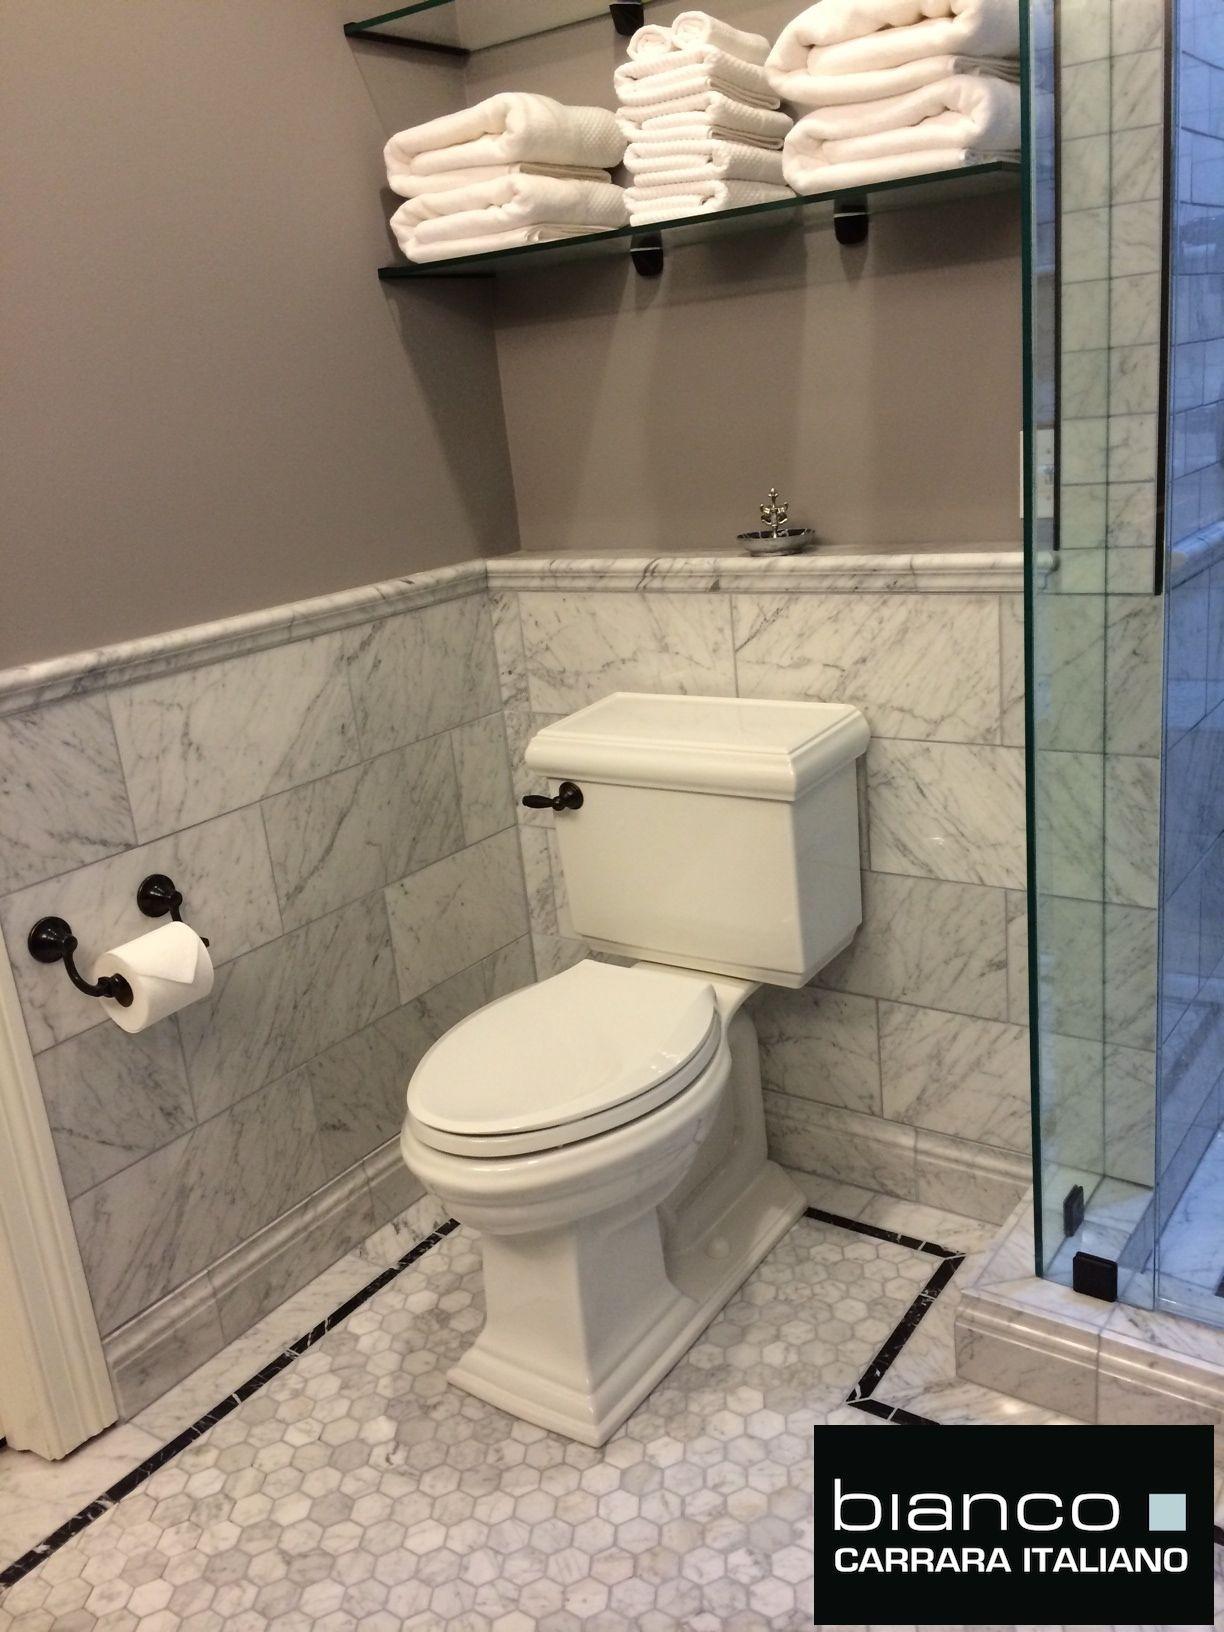 Carrara Bianco Marble Bathroom Bianco Carrara Marble Pinterest Carrara Subway Tiles And